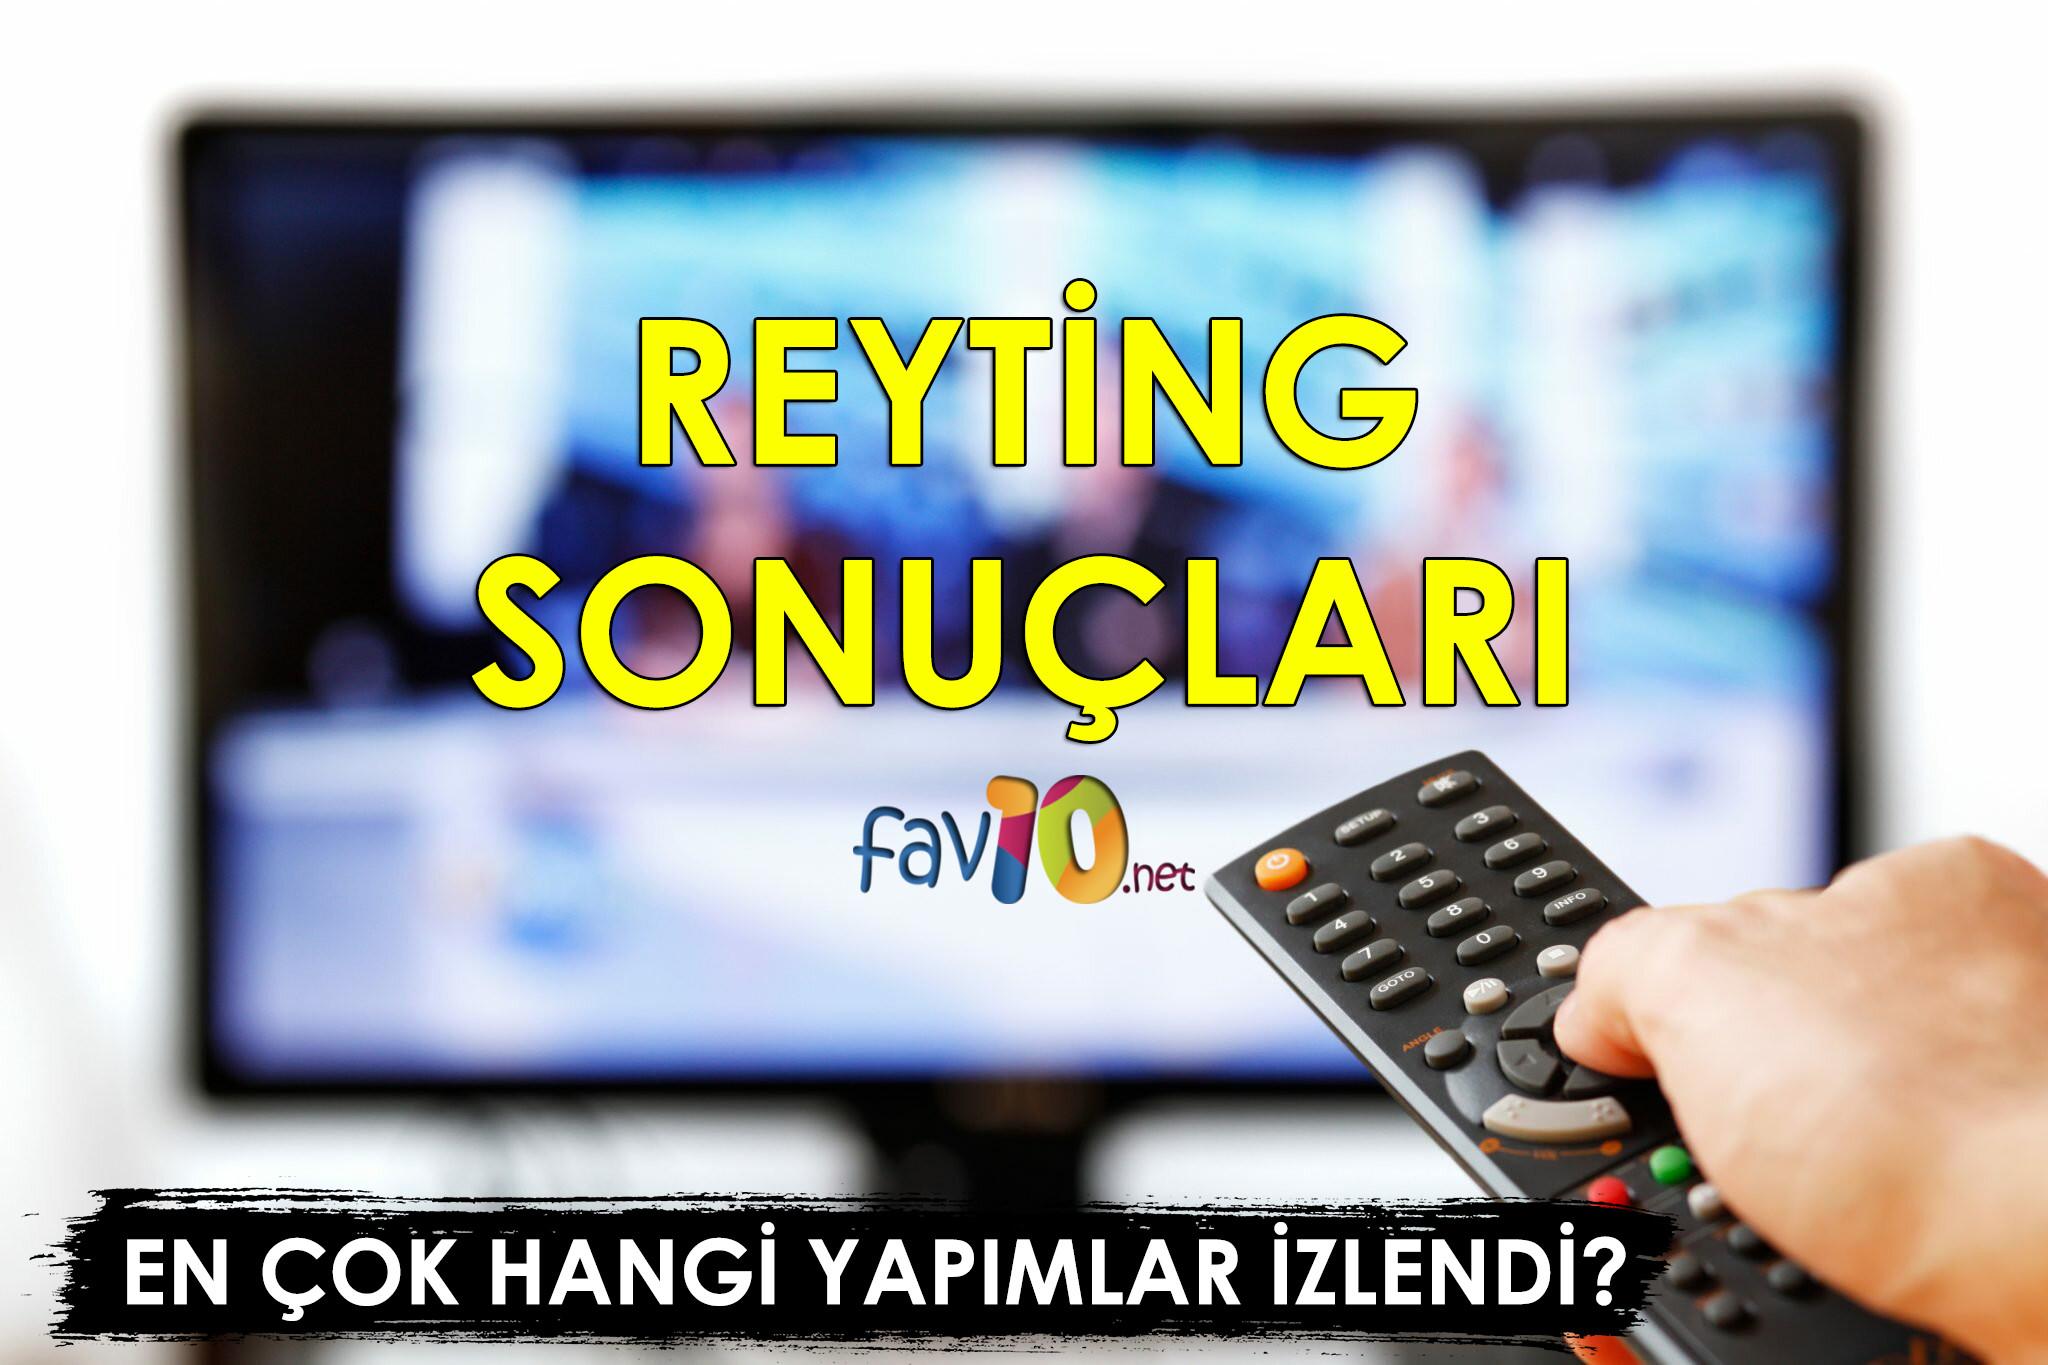 ReytingSonuclari-Fav10.jpg